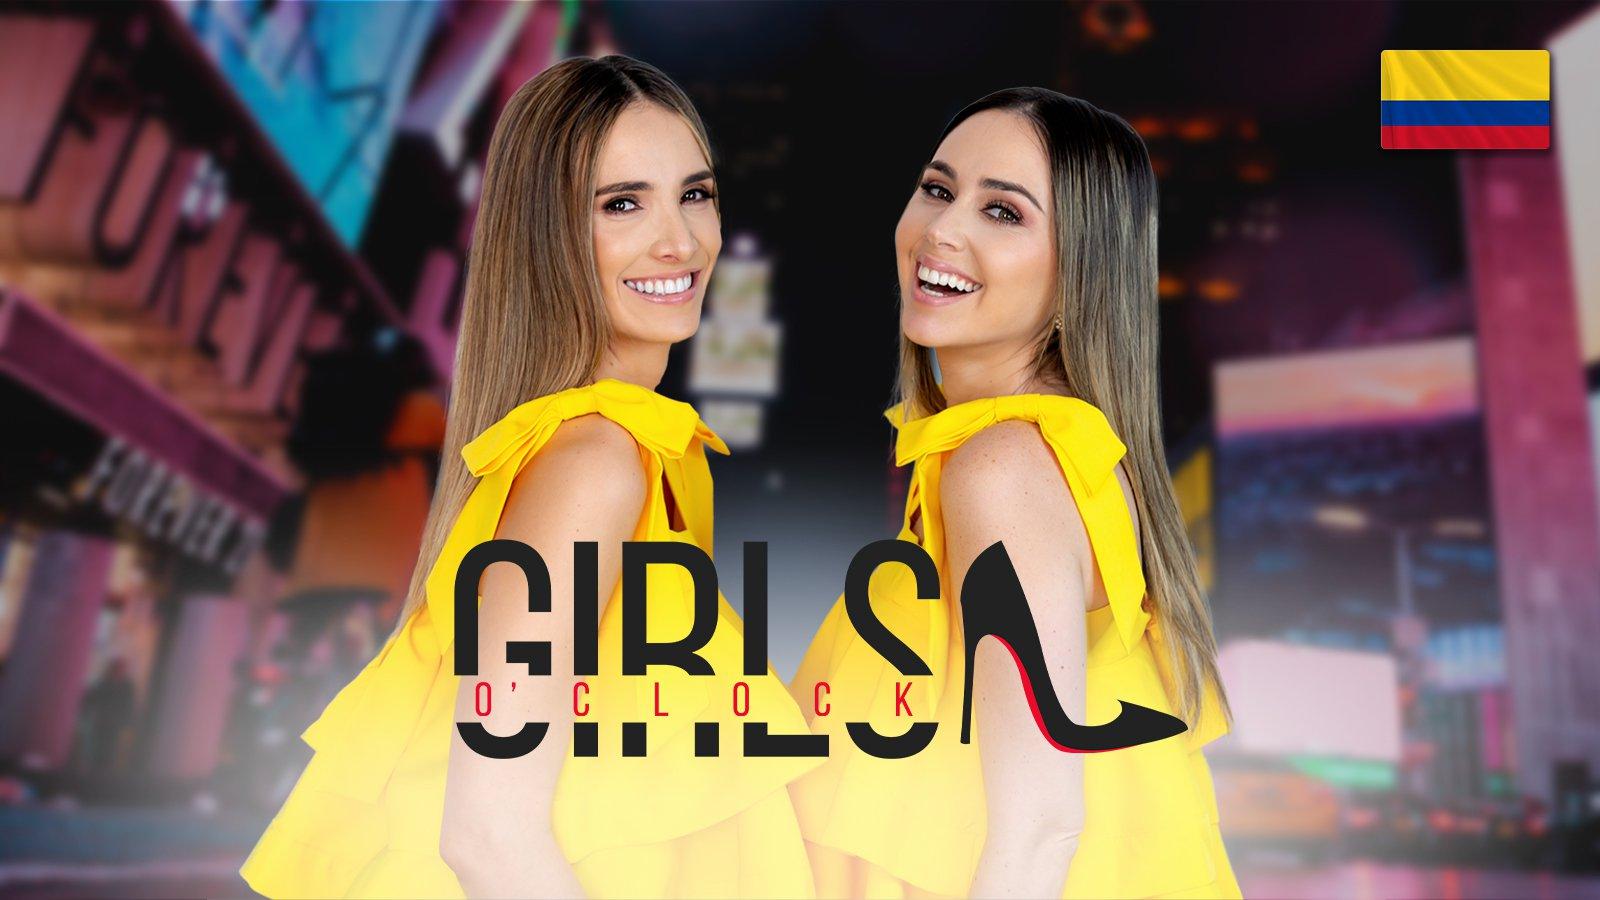 Girls O'Clock poster